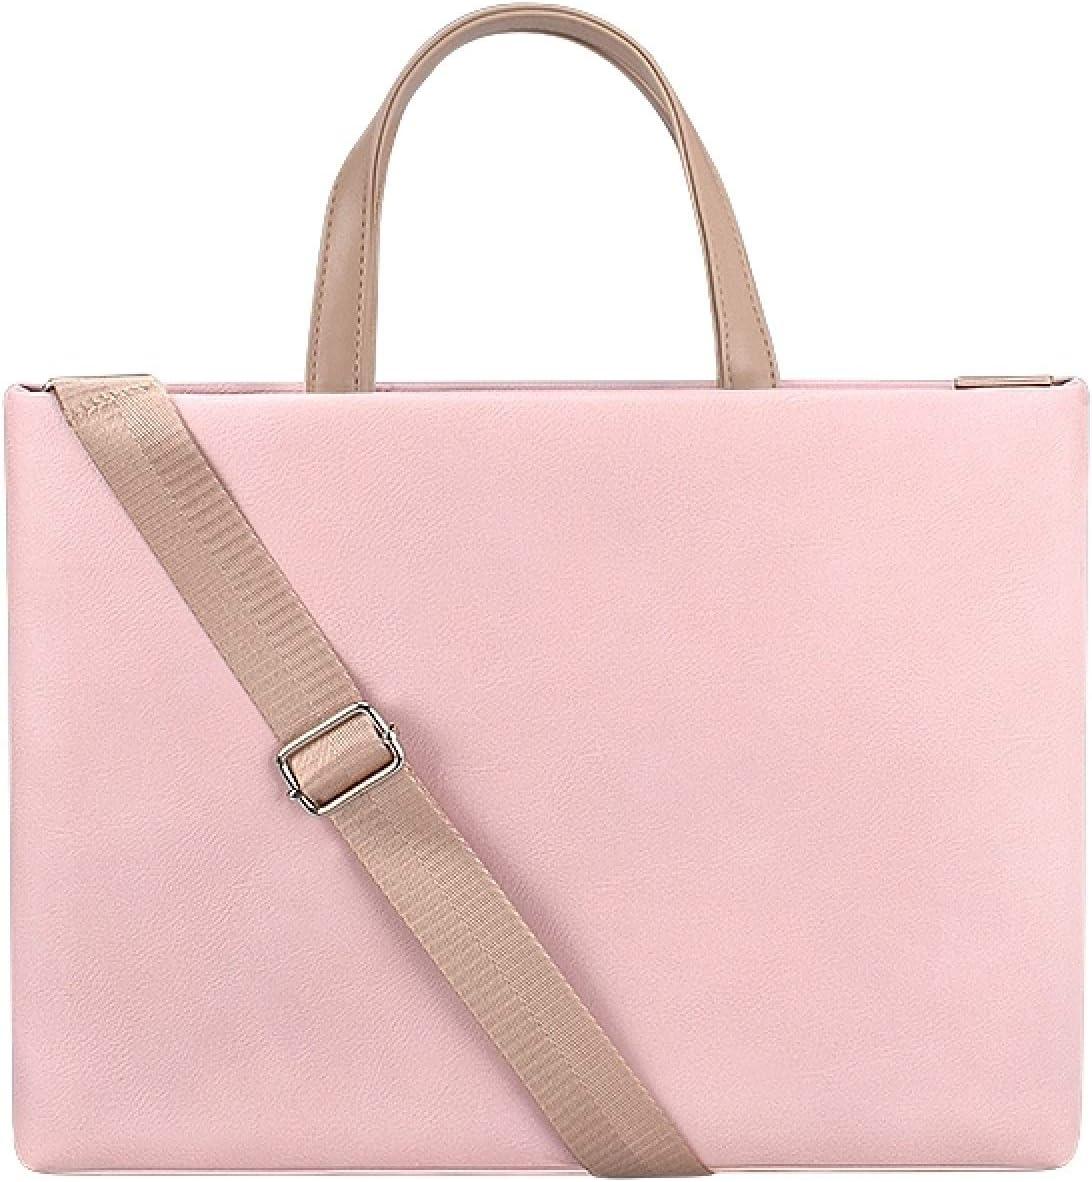 CAOMING PU Waterproof cheap Laptop Handbag inch 14.1 Bag latest for Crossbody